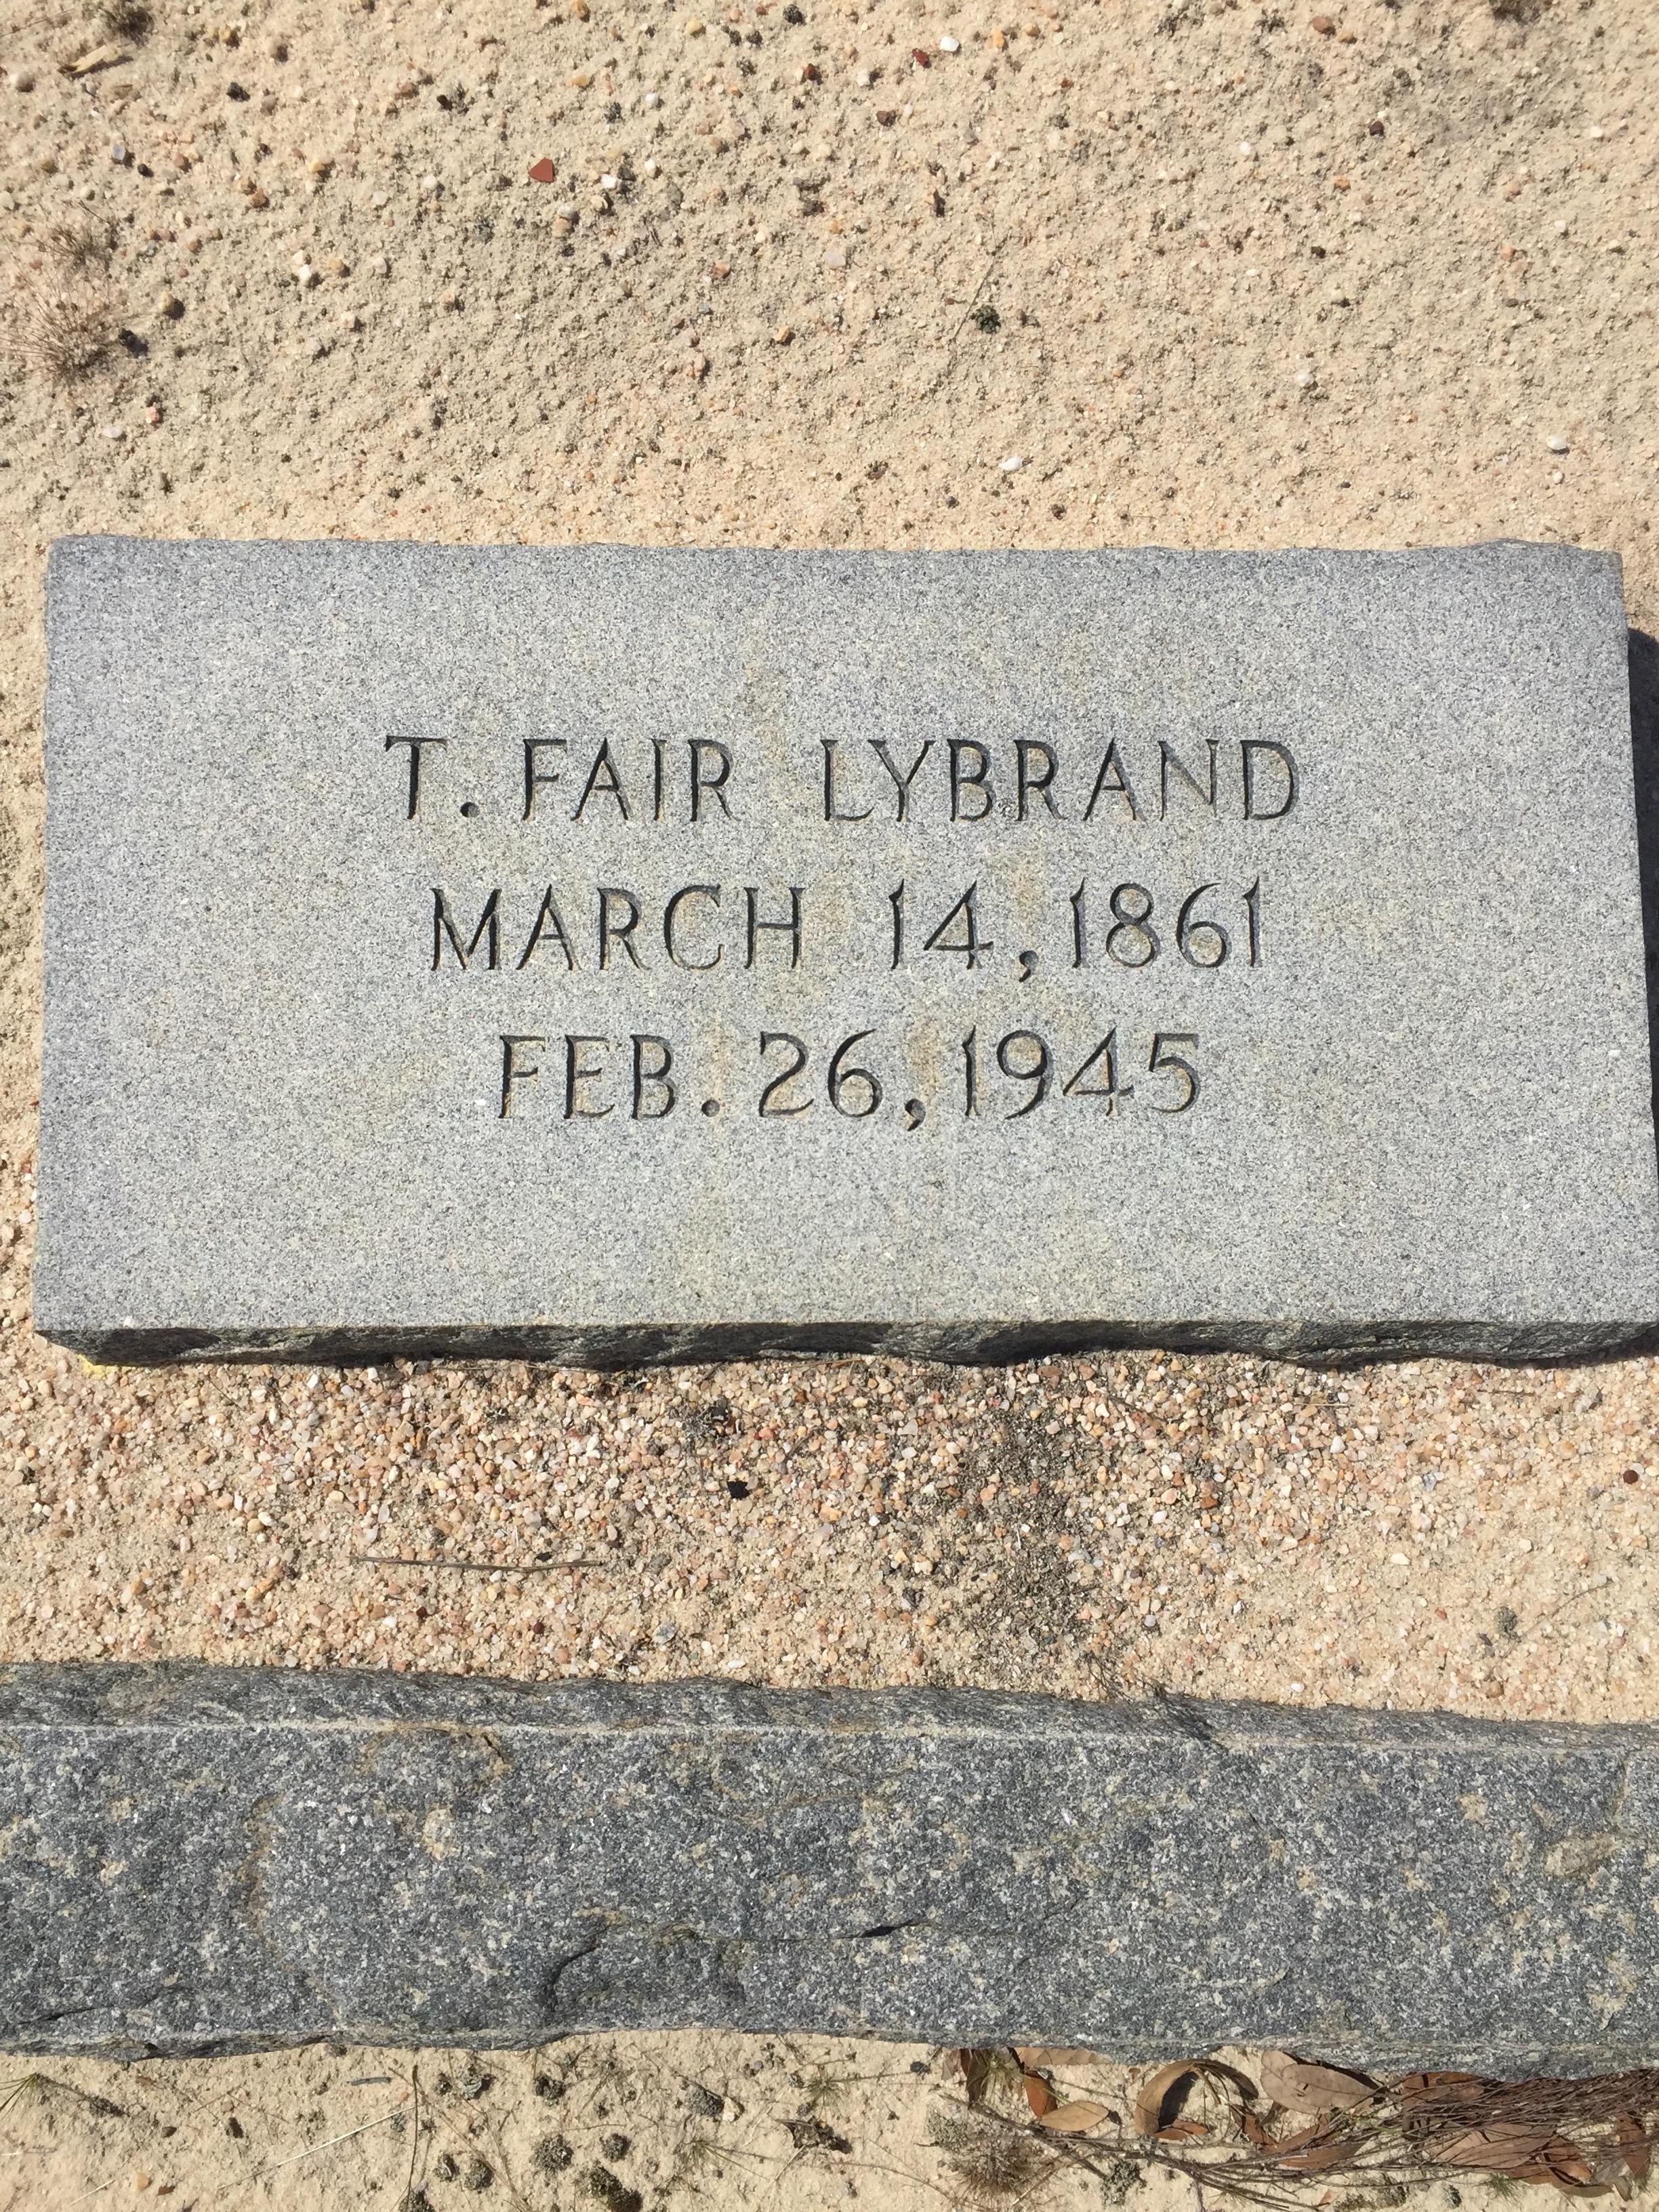 Thomas Fair Lybrand